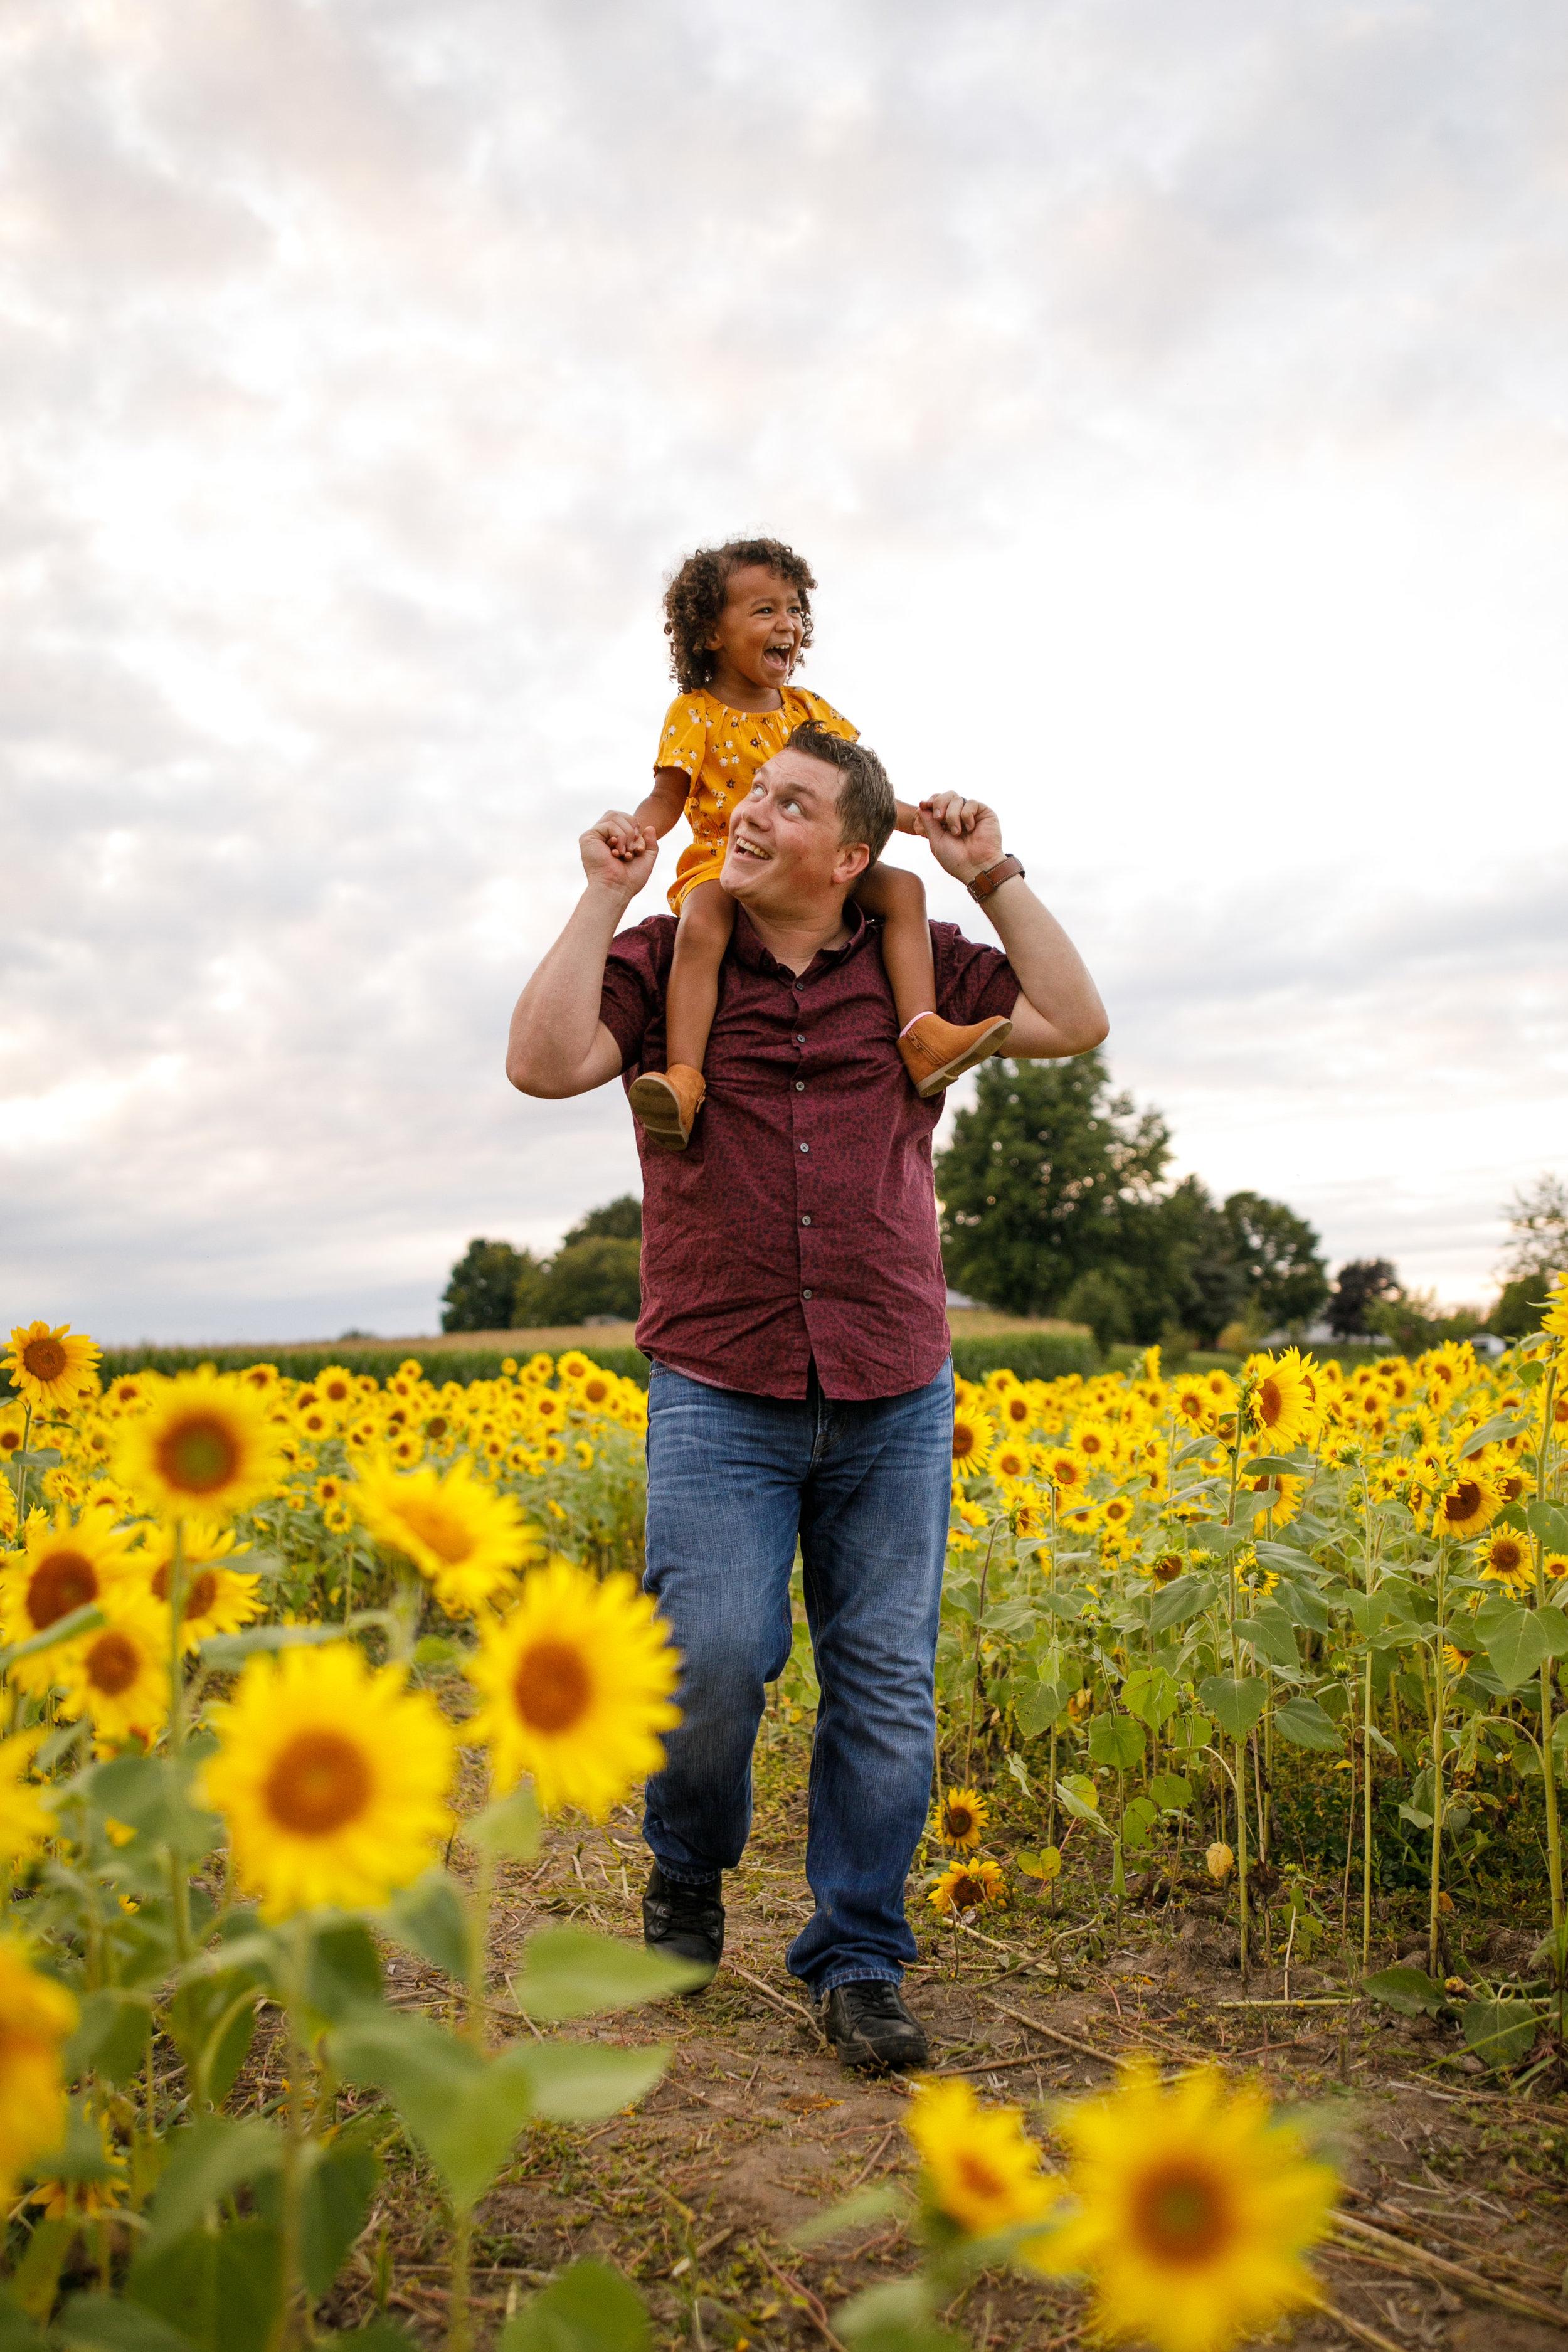 Morris Family Summer 2019 - Grand Rapids Photographer - Grand Rapids Family Photographer - Ed Dunneback and Girls - J Darling Photo 037.jpg